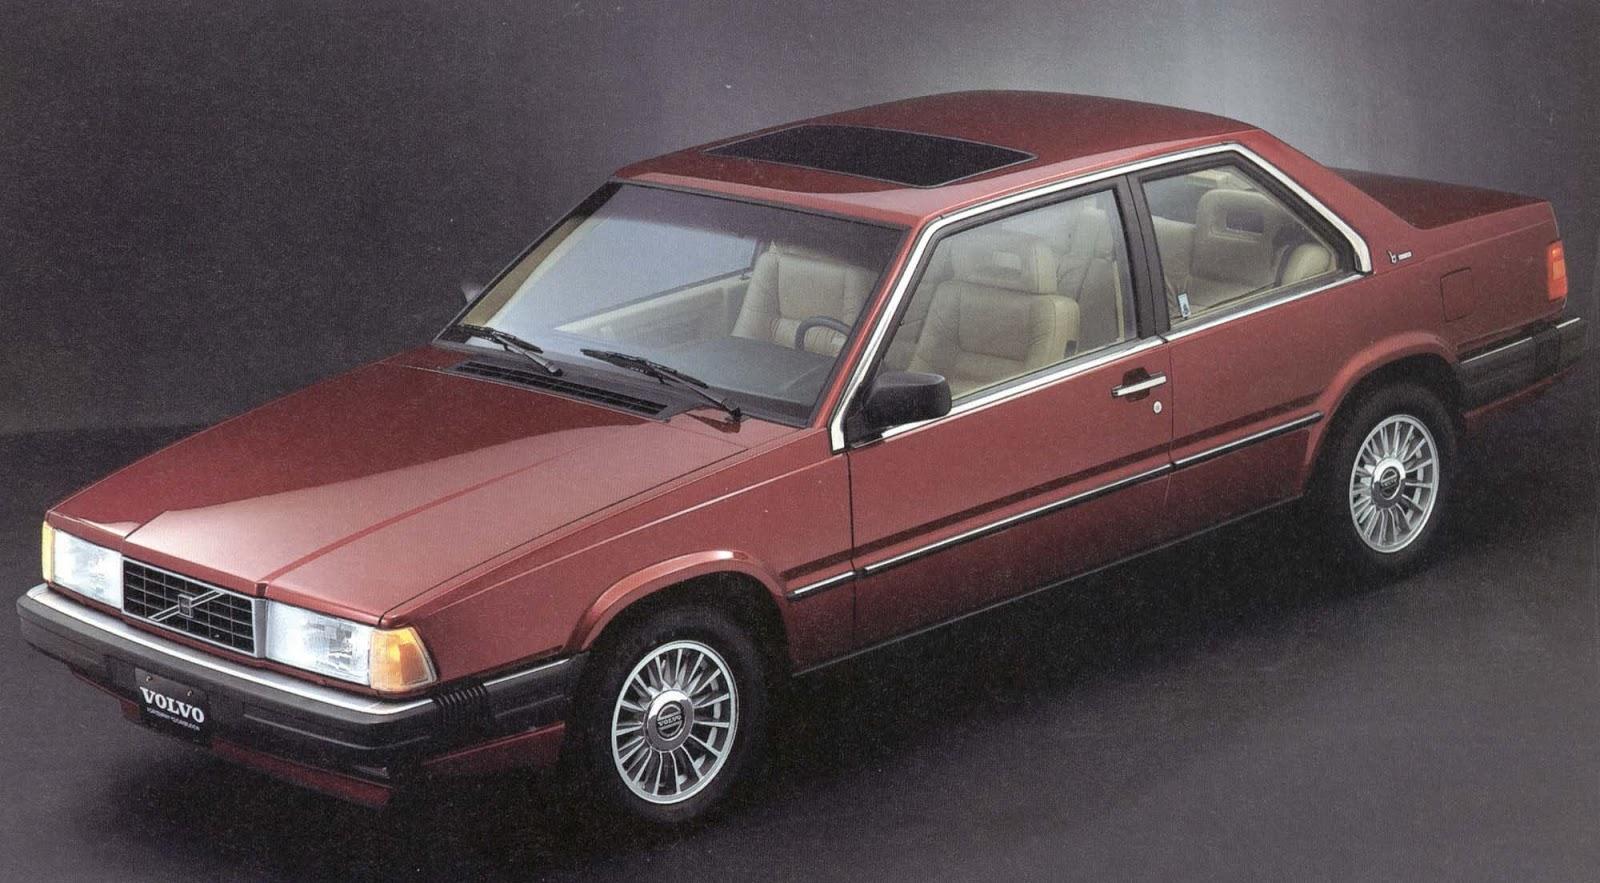 Volvo 780 Bertone 1986-1991 | phscollectorcarworld